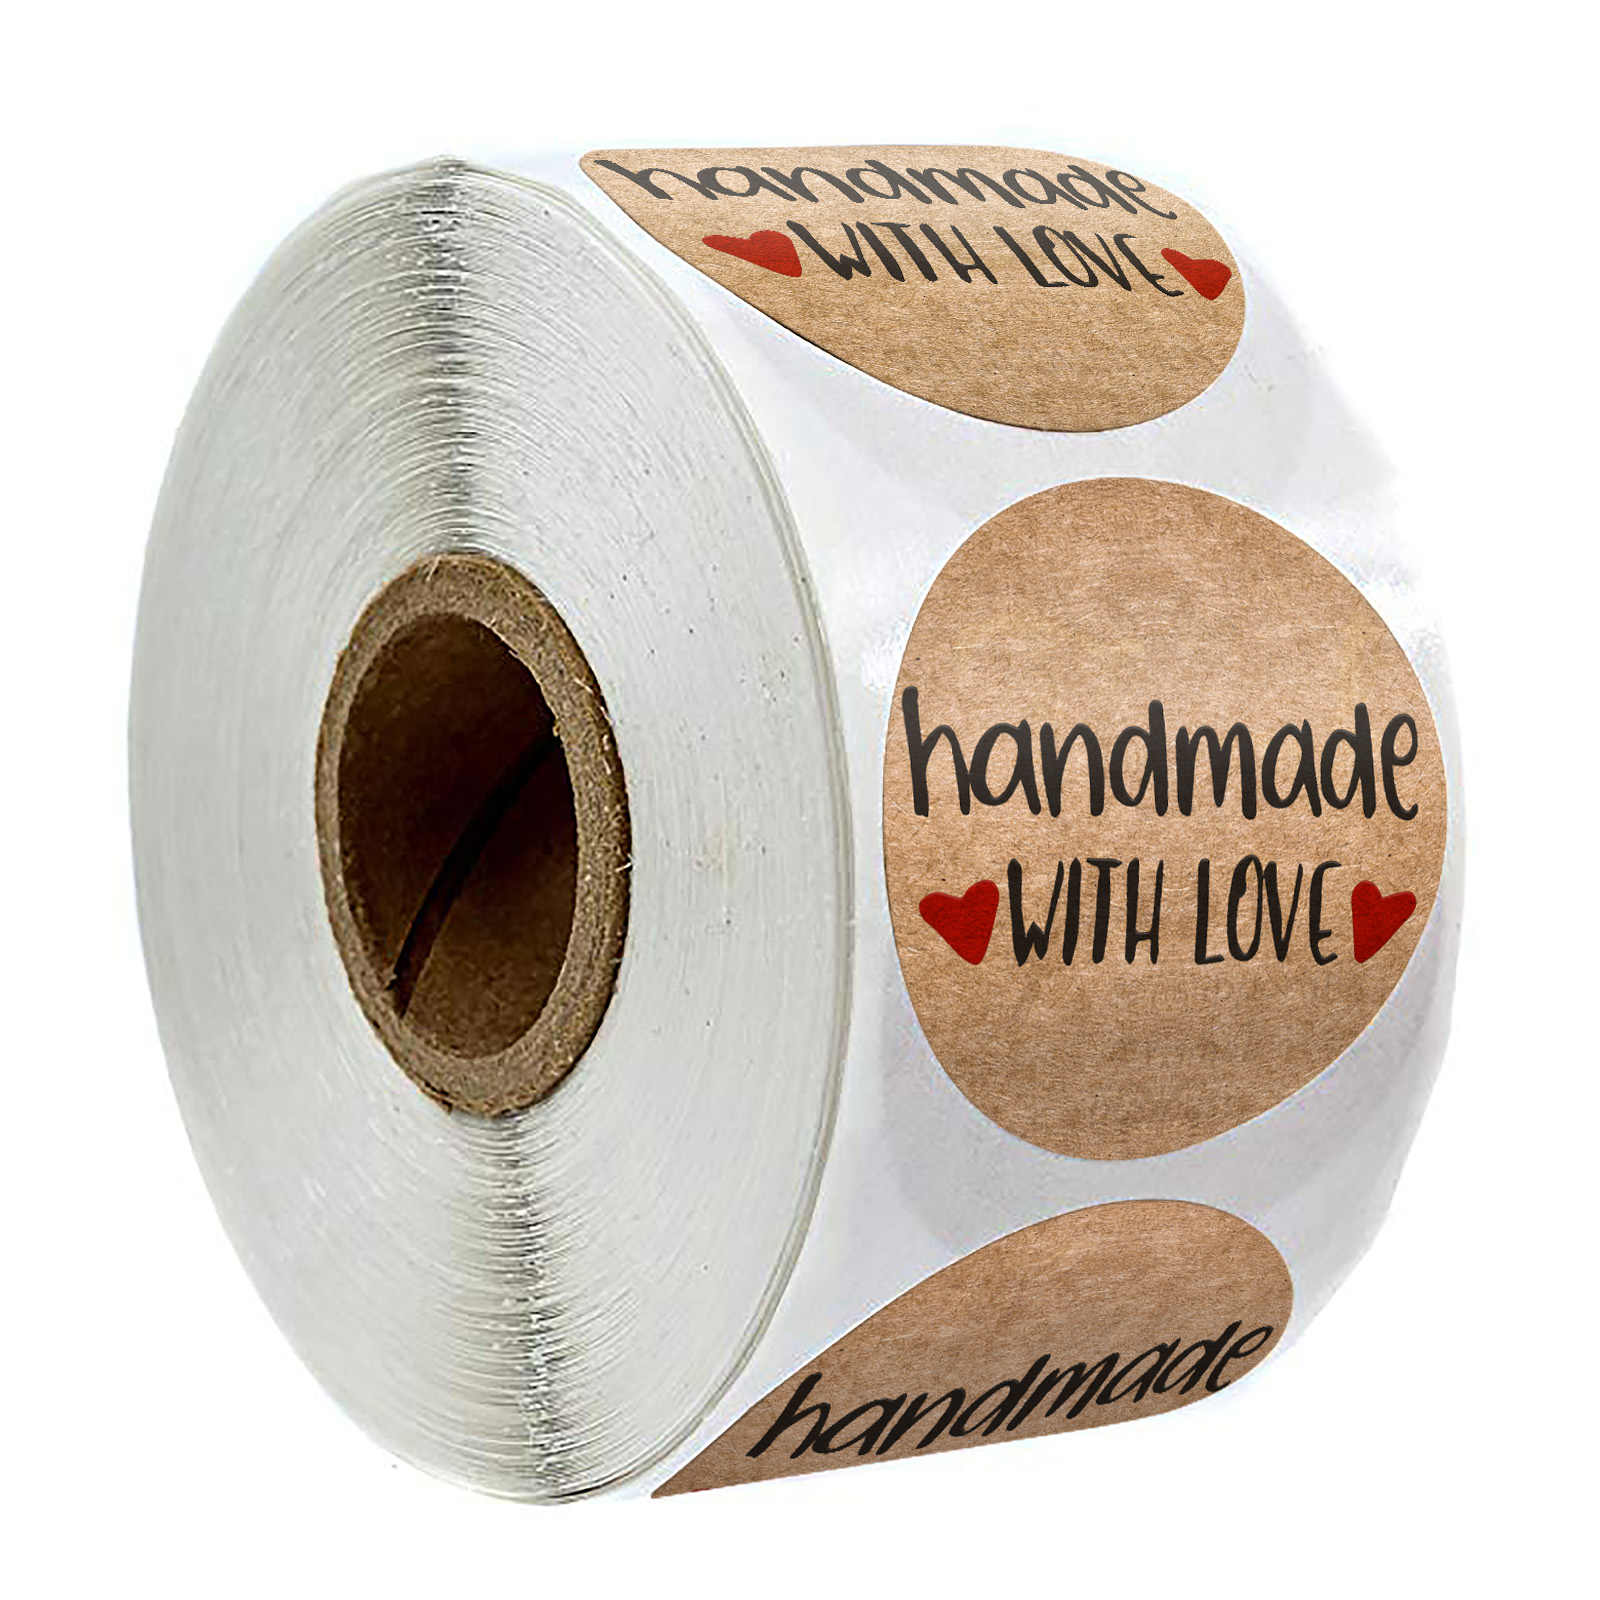 300Pcs Kraft Handmade Baking Sticker Self-Adhesive Label Handmade Adhesive Stick